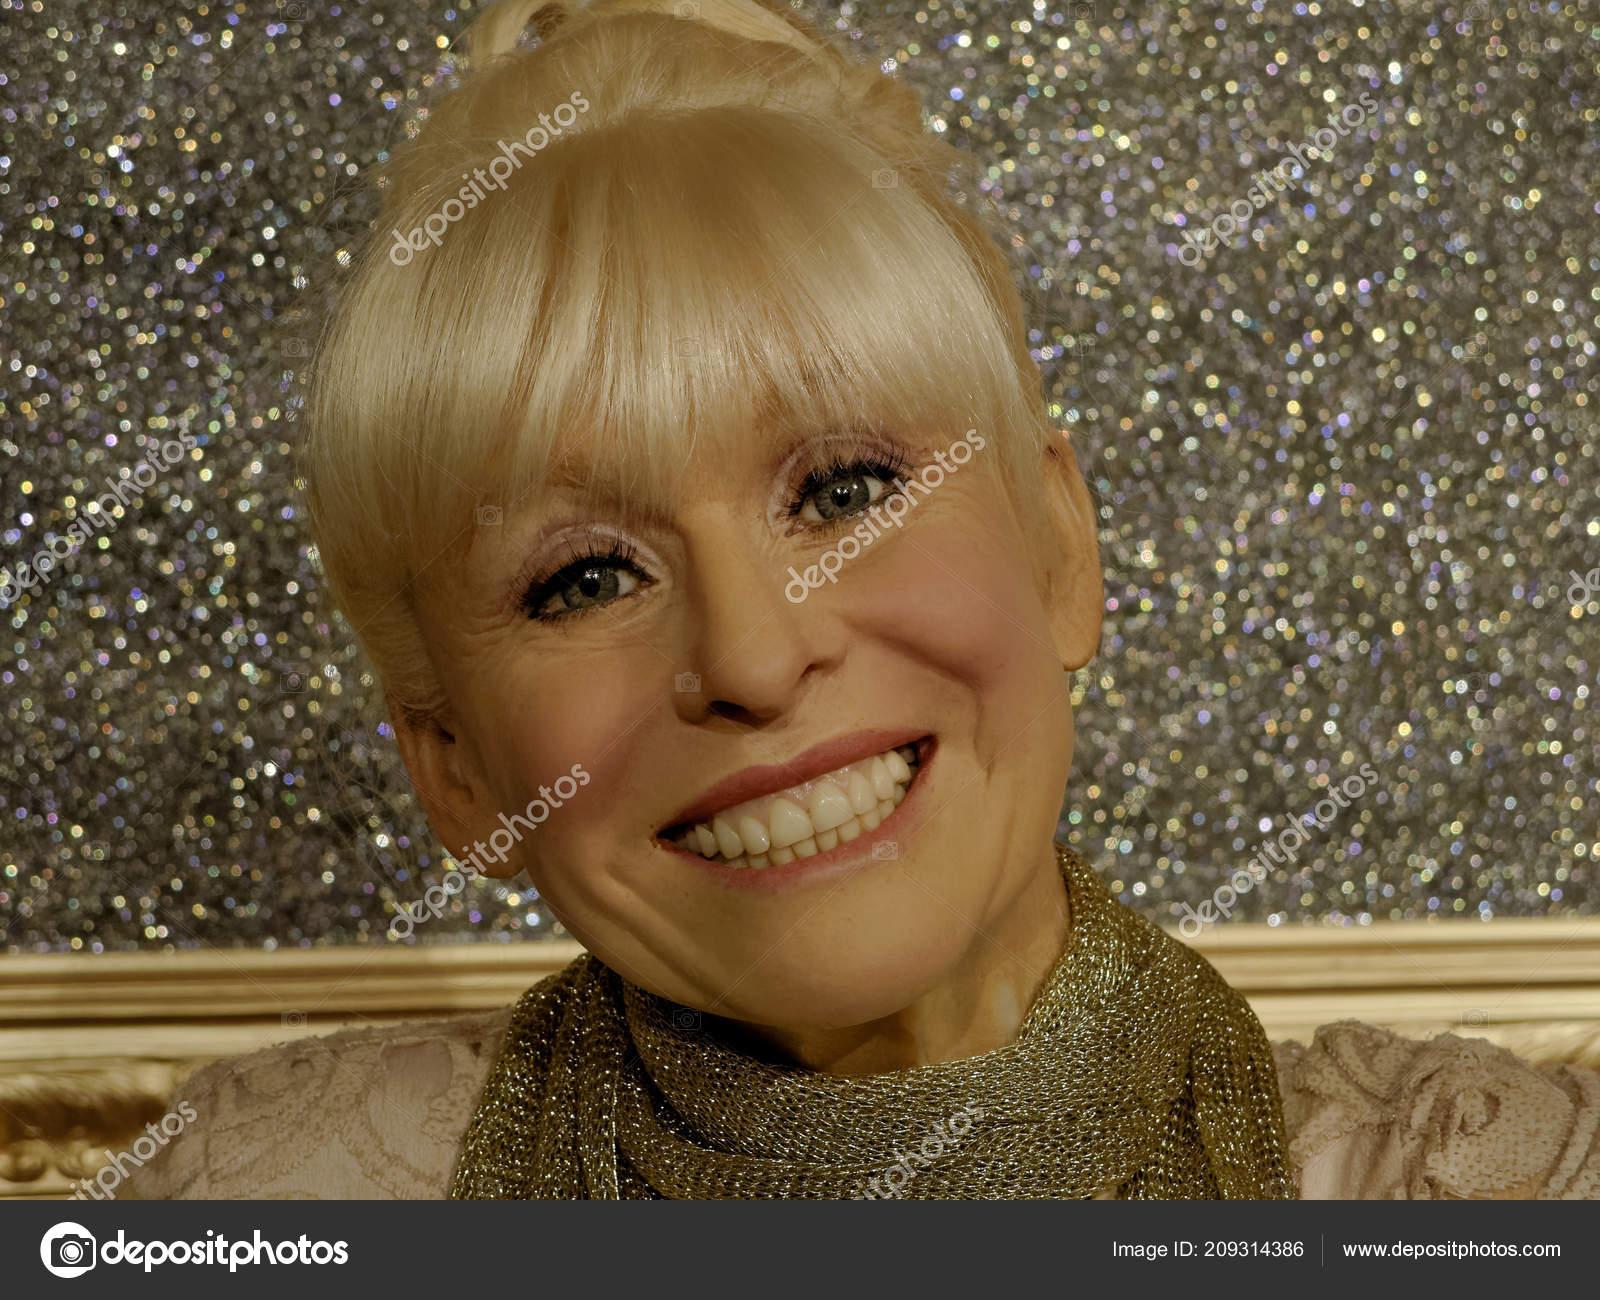 ba30cdafd2d Αθήνα Ιανουαρίου Madame Tussauds Ηνωμένο Βασίλειο 2018 Σχήμα Κεριού ...